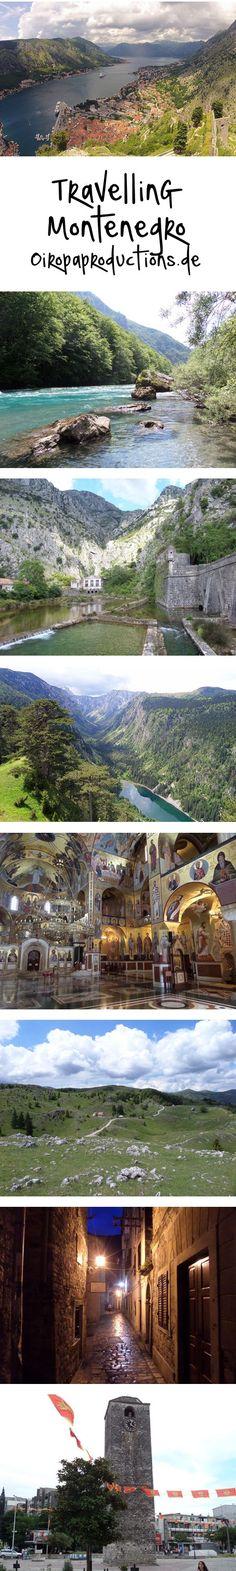 Travelling Montenegro Reise Montenegro Kotor, Durmitor Nationalpark, Zabljak, Podgorica